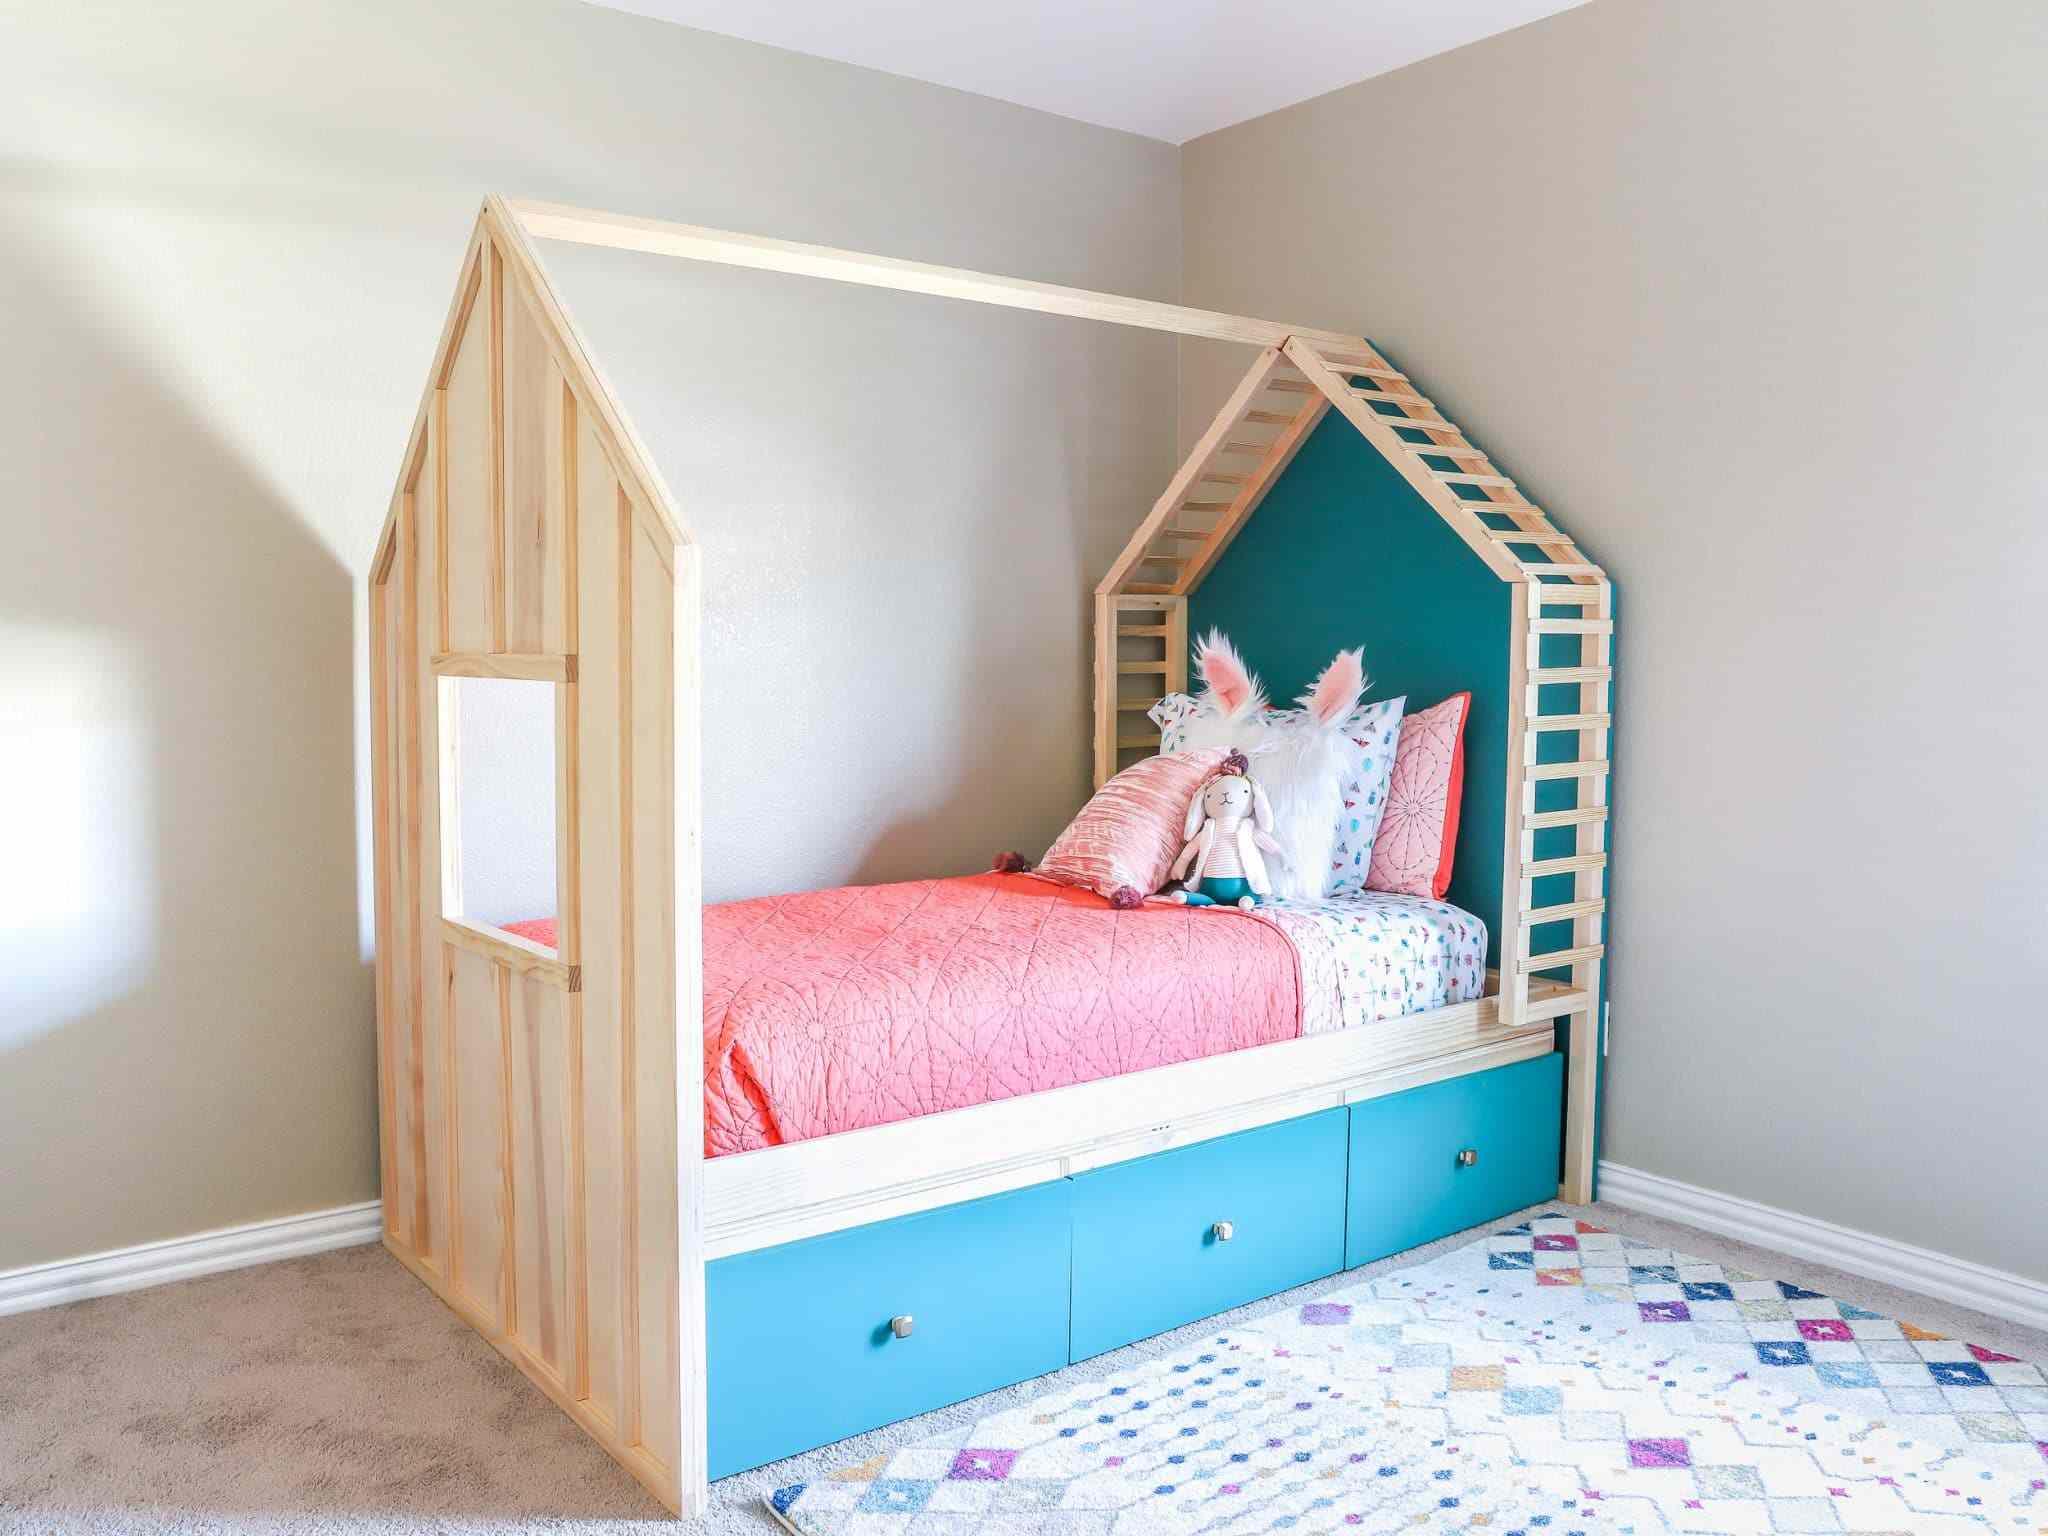 DIY kids bed with storage